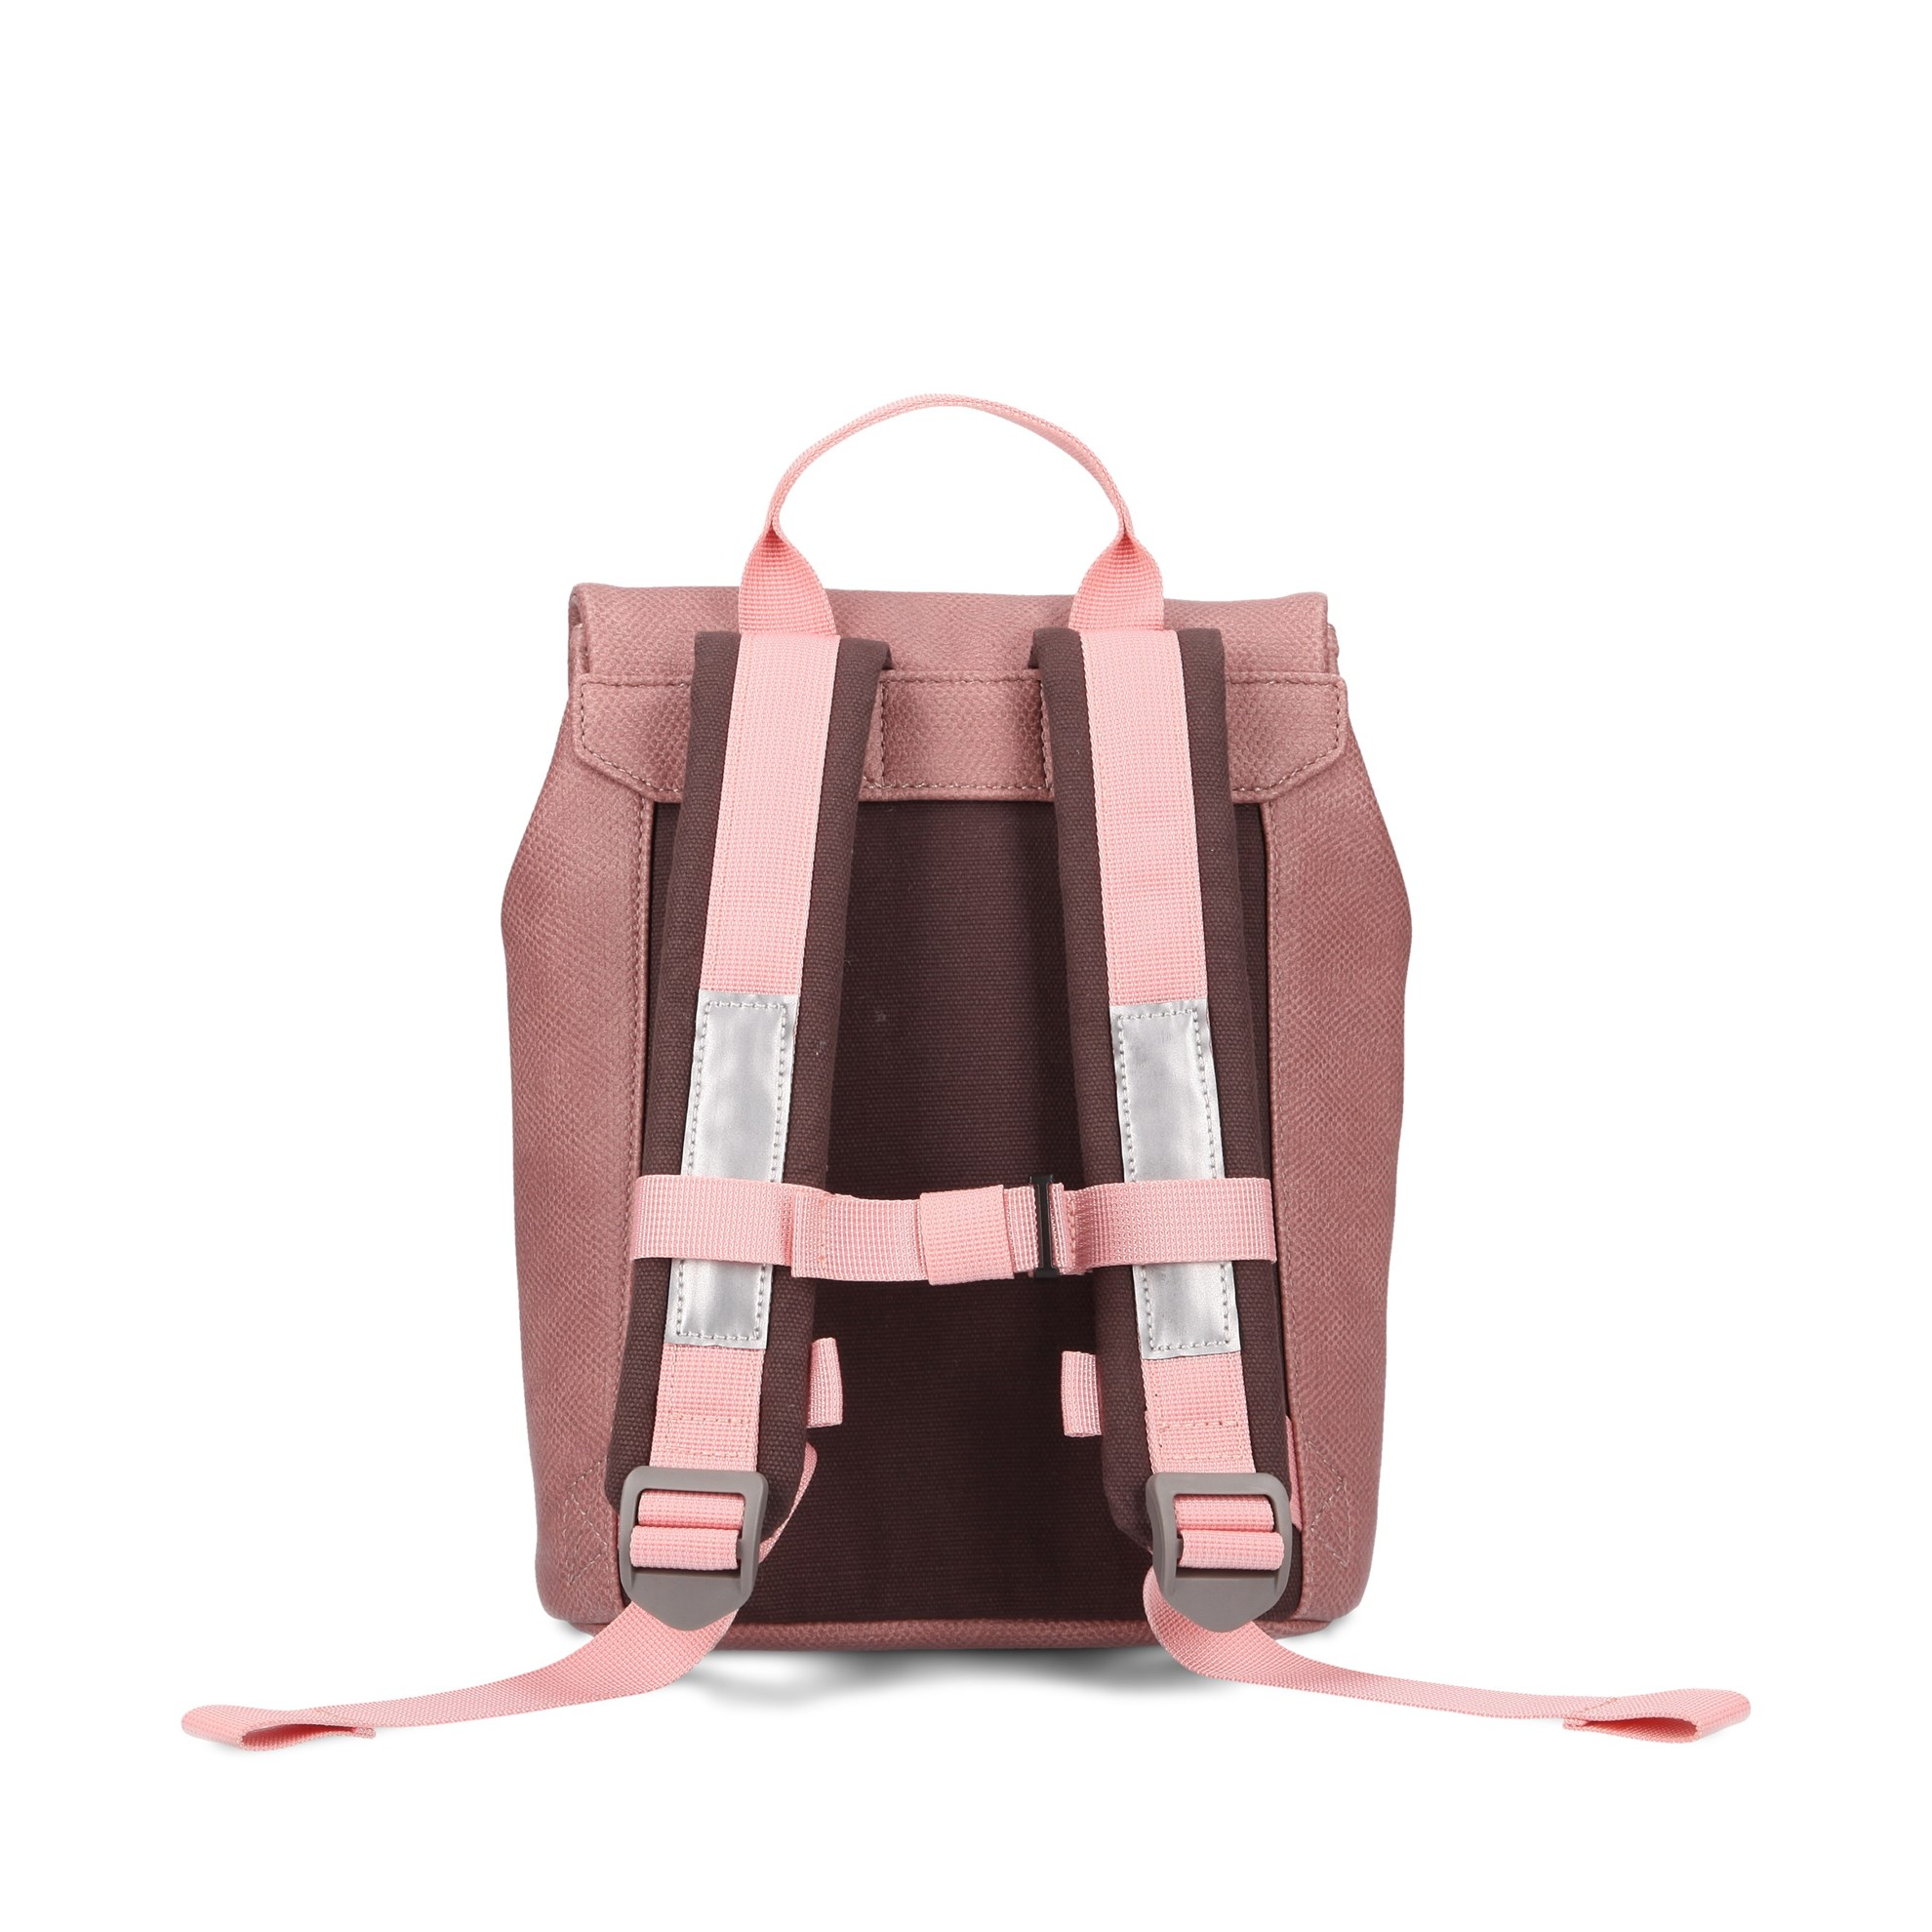 Dětský batoh ZWEI MADEMOISELLE MKR30_0